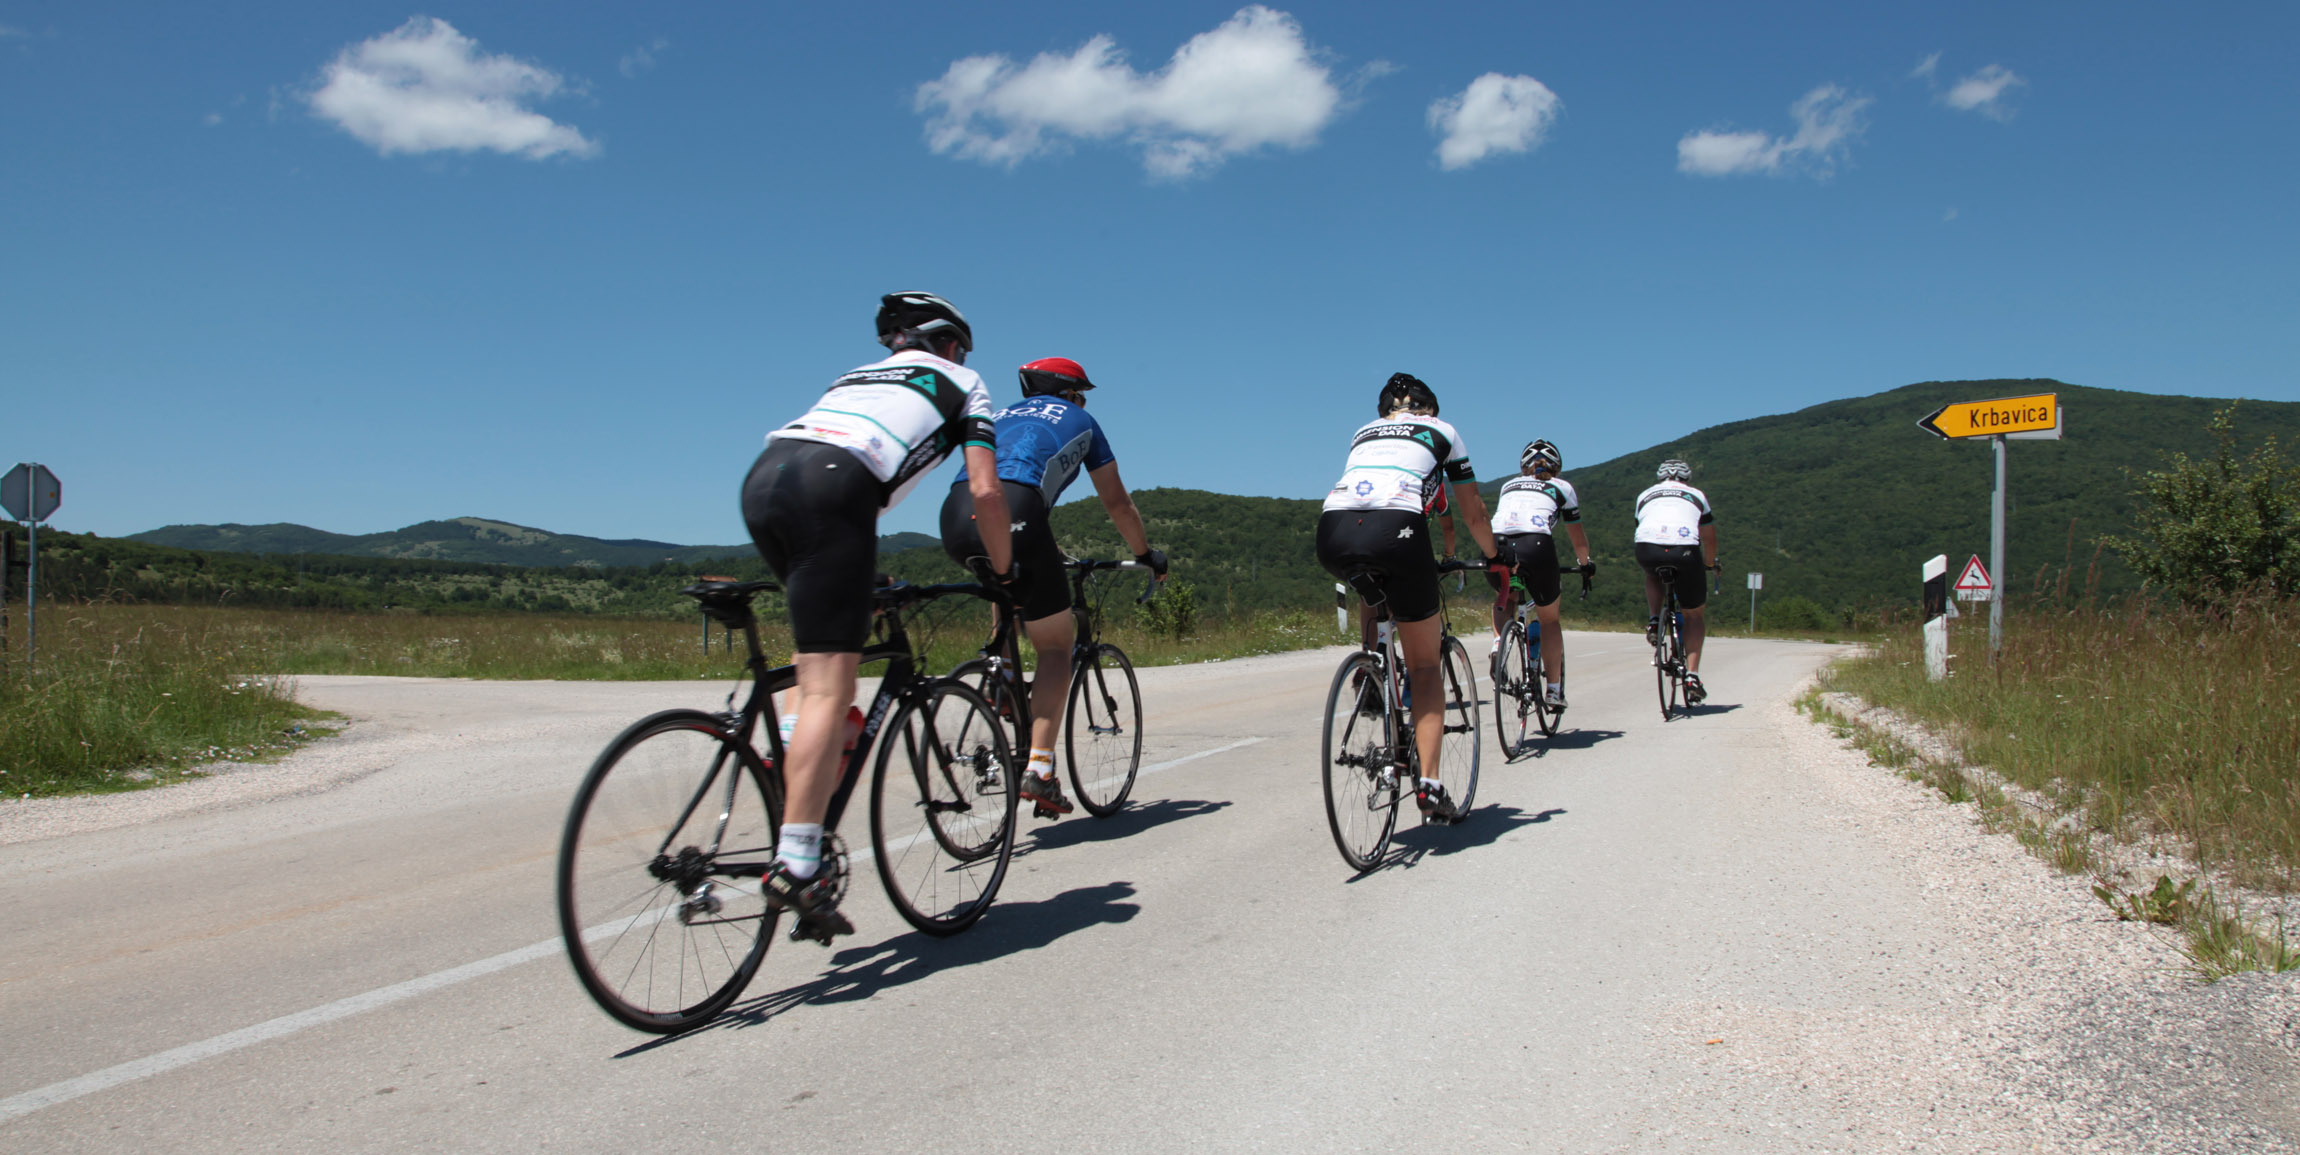 croatia biking